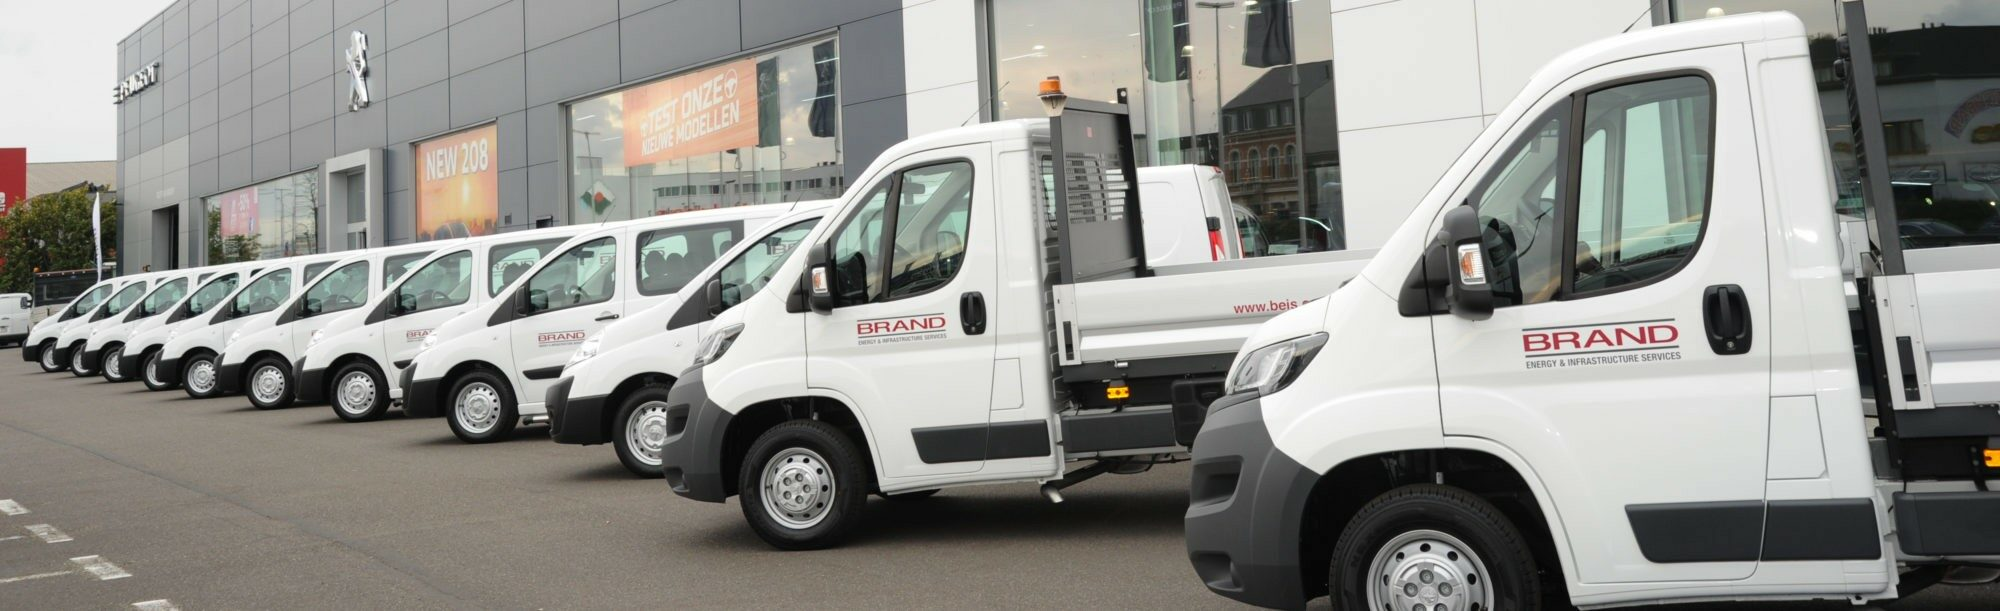 Brand Energy Peugeot LeasePlan